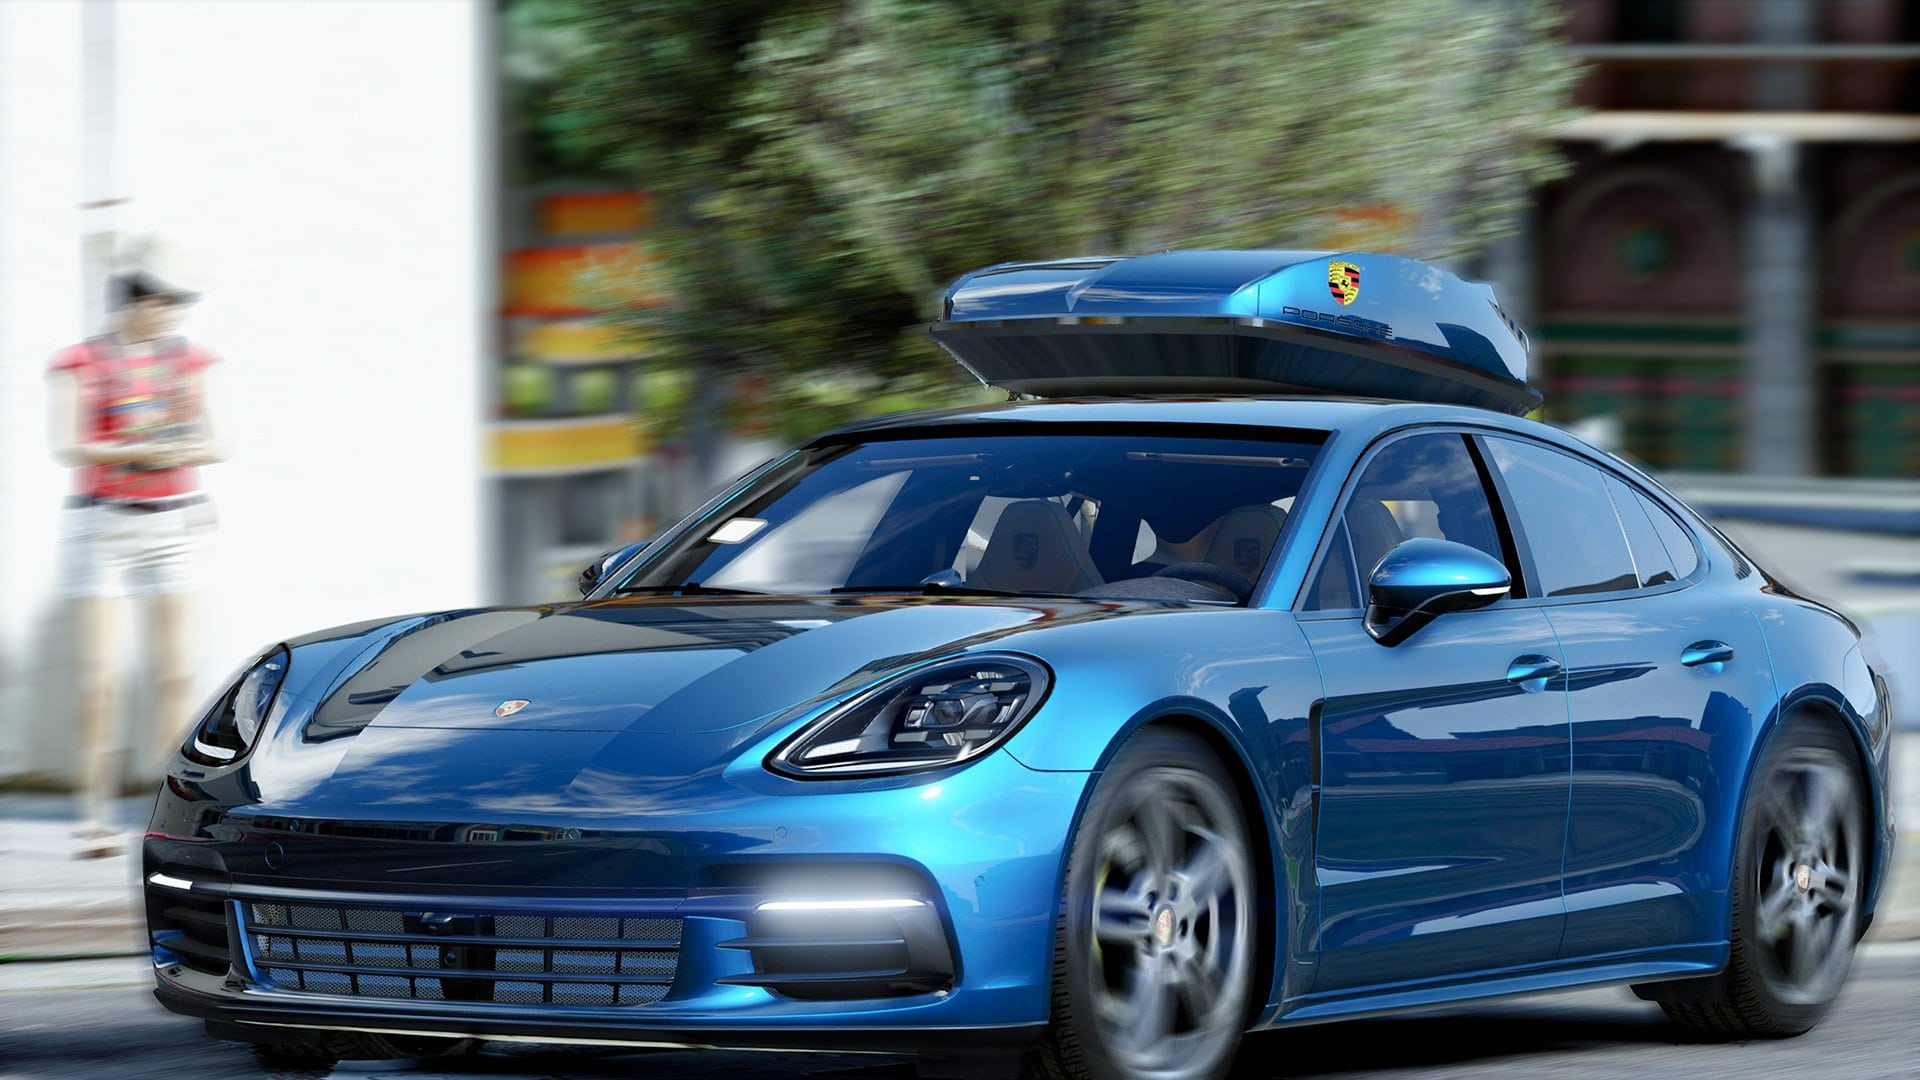 Porsche Panamera 2 Full hd wallpapers